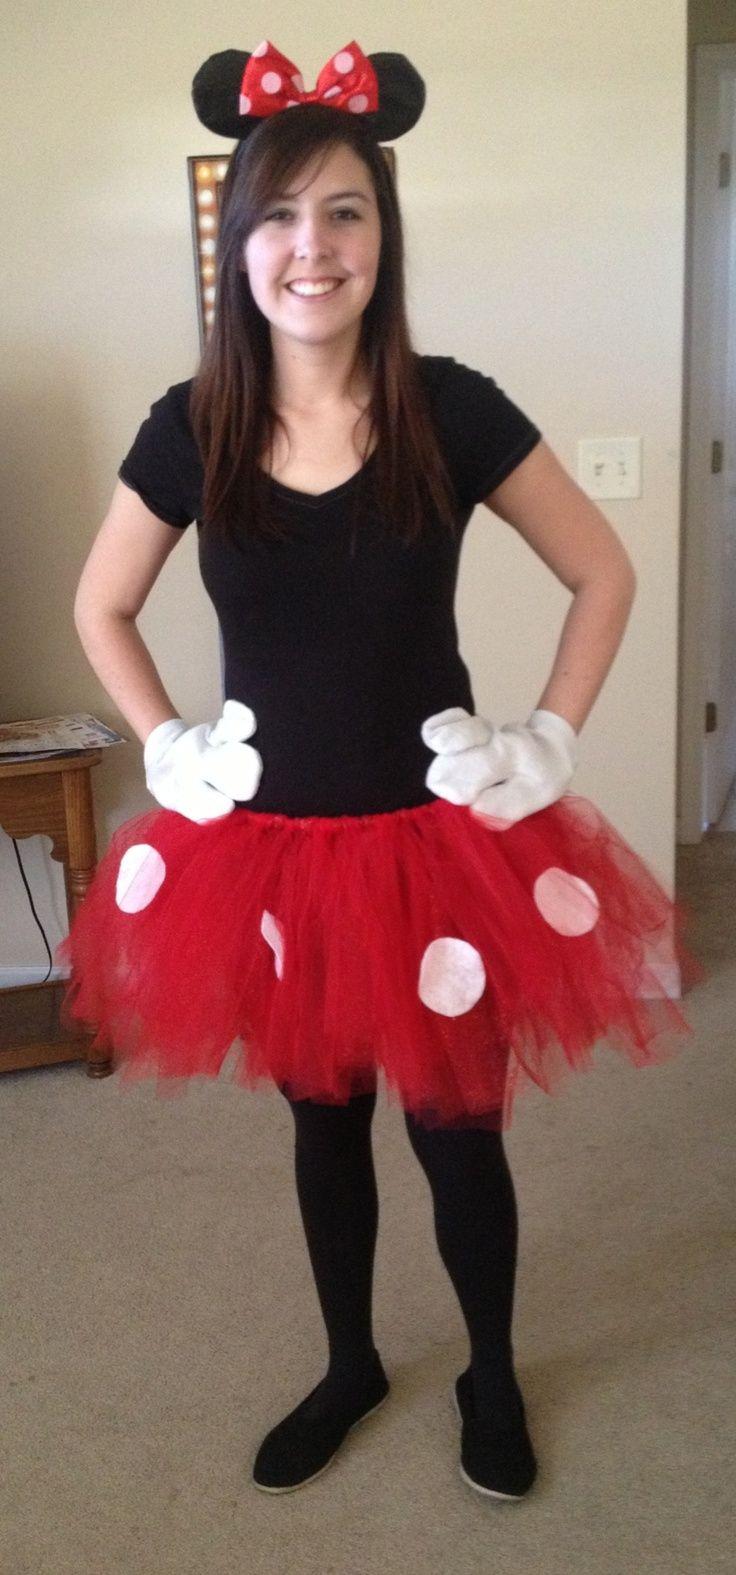 minnie mouse costume google search kost me pinterest. Black Bedroom Furniture Sets. Home Design Ideas